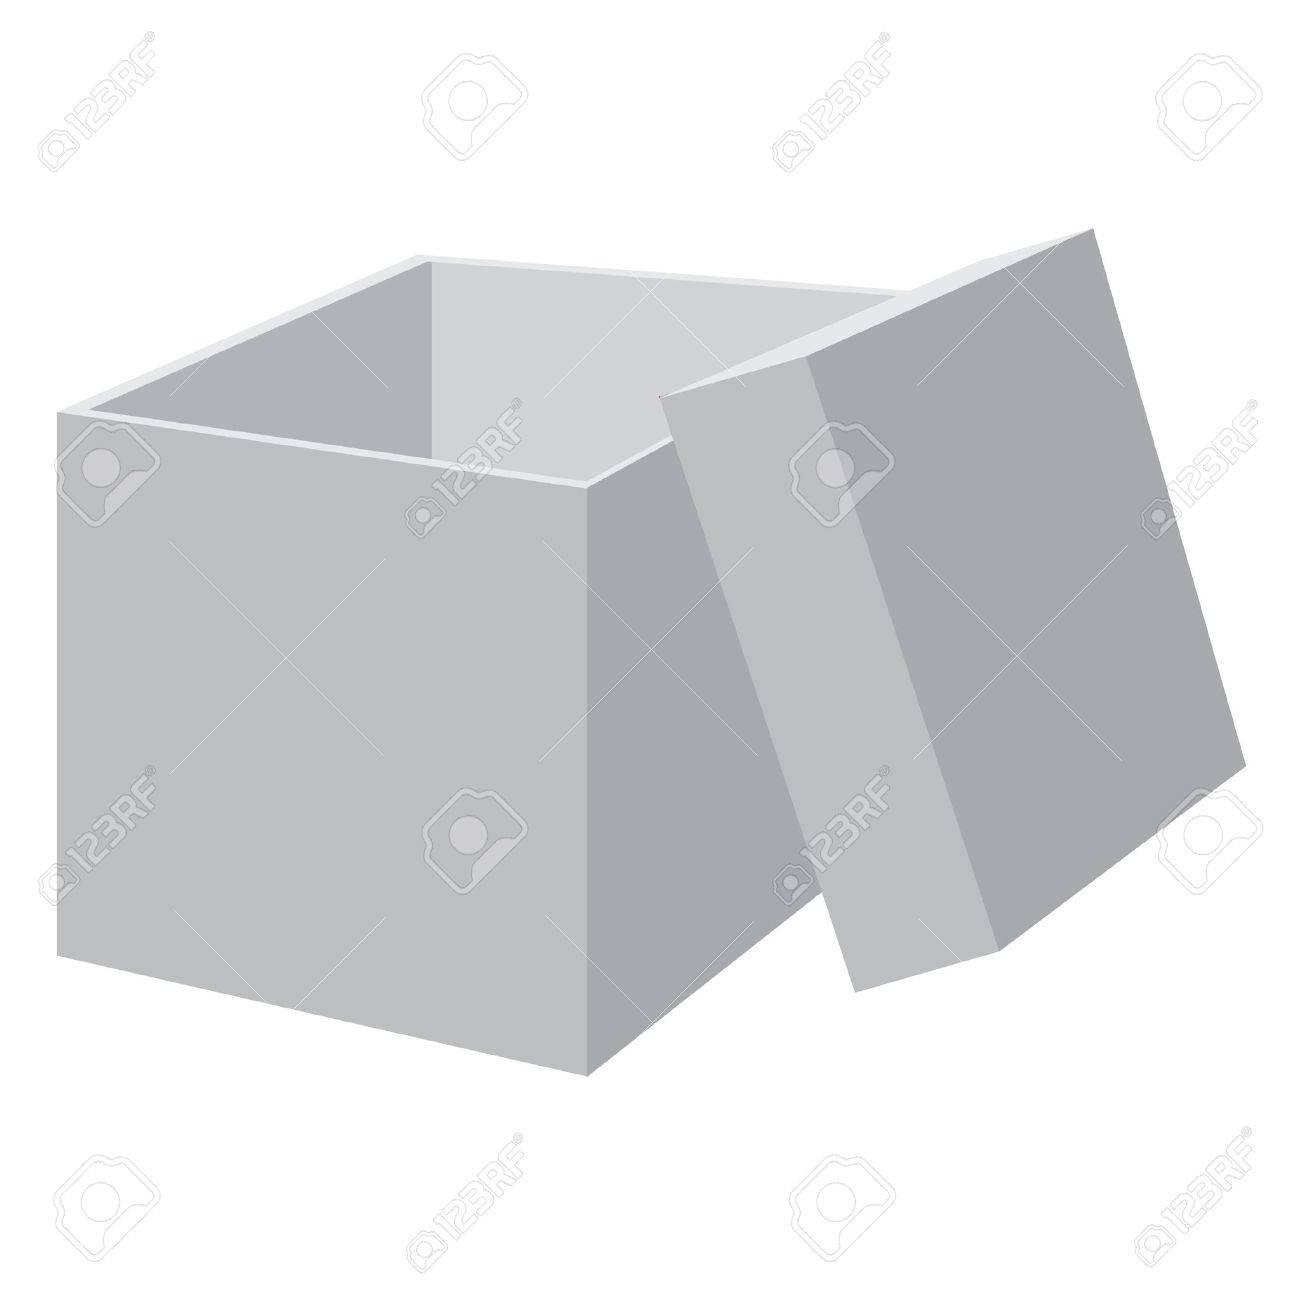 White blank open box. Vector illustration. Stock Vector - 9225087